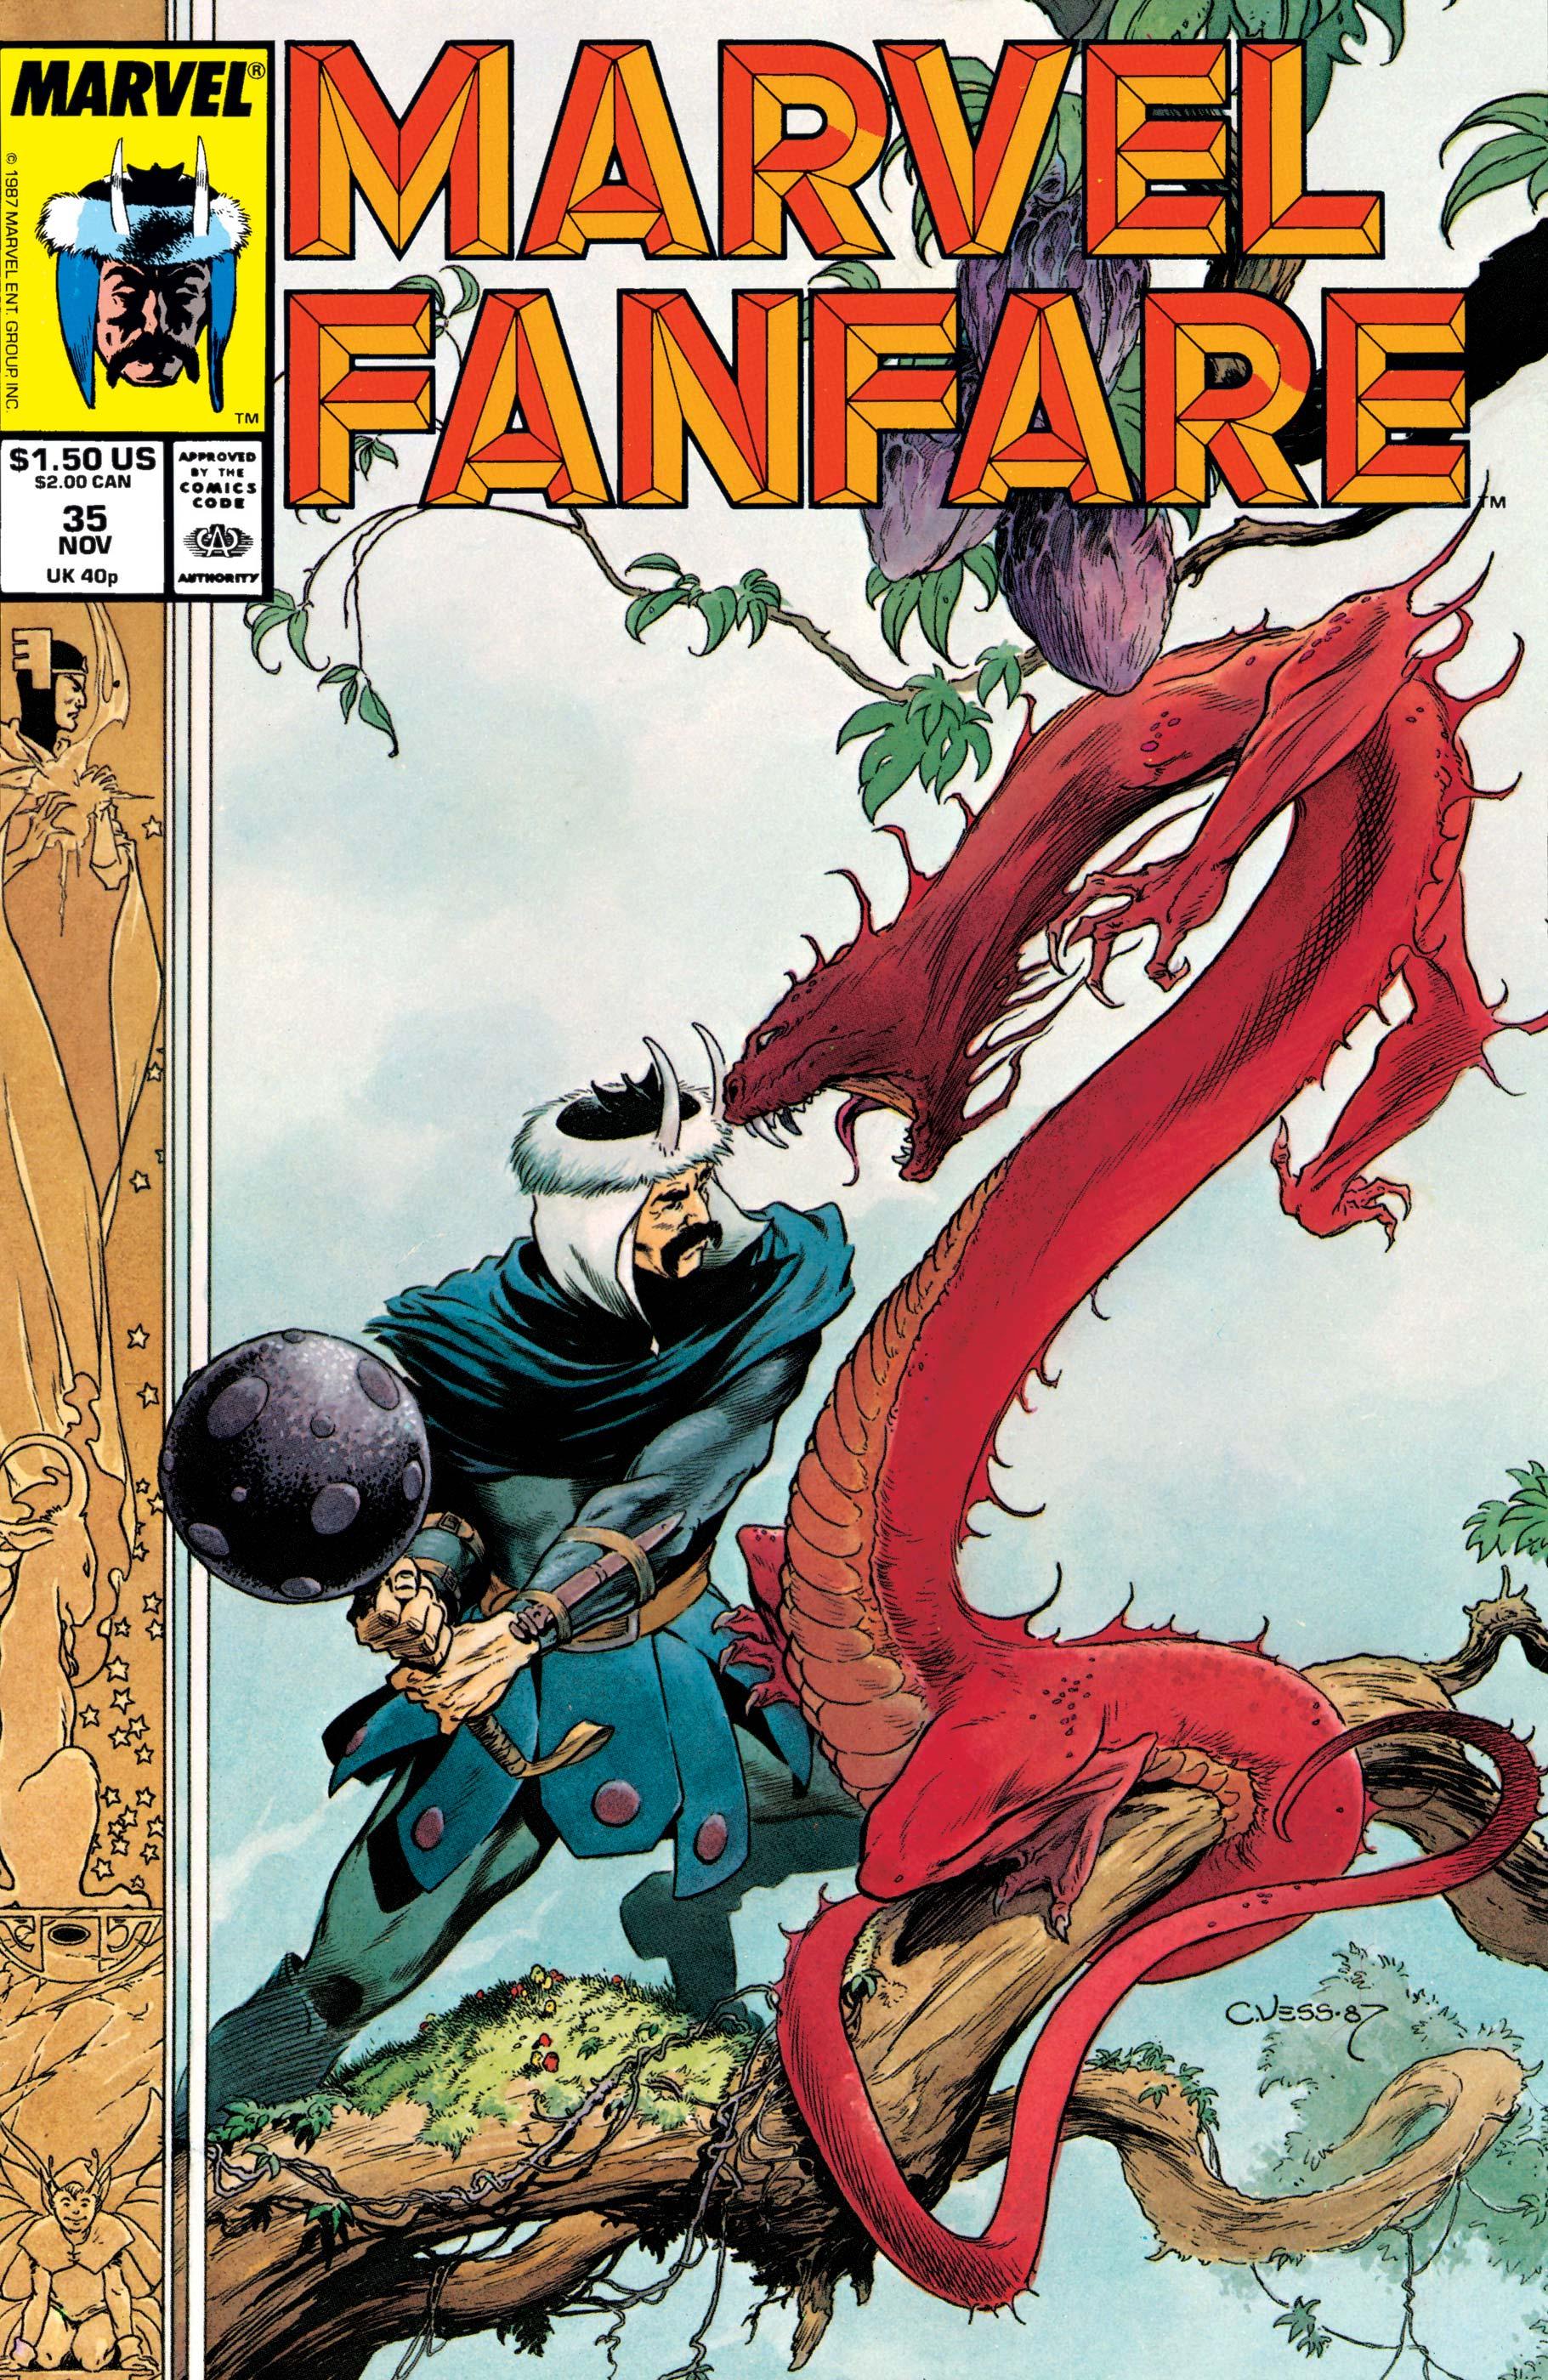 Marvel Fanfare (1982) #35